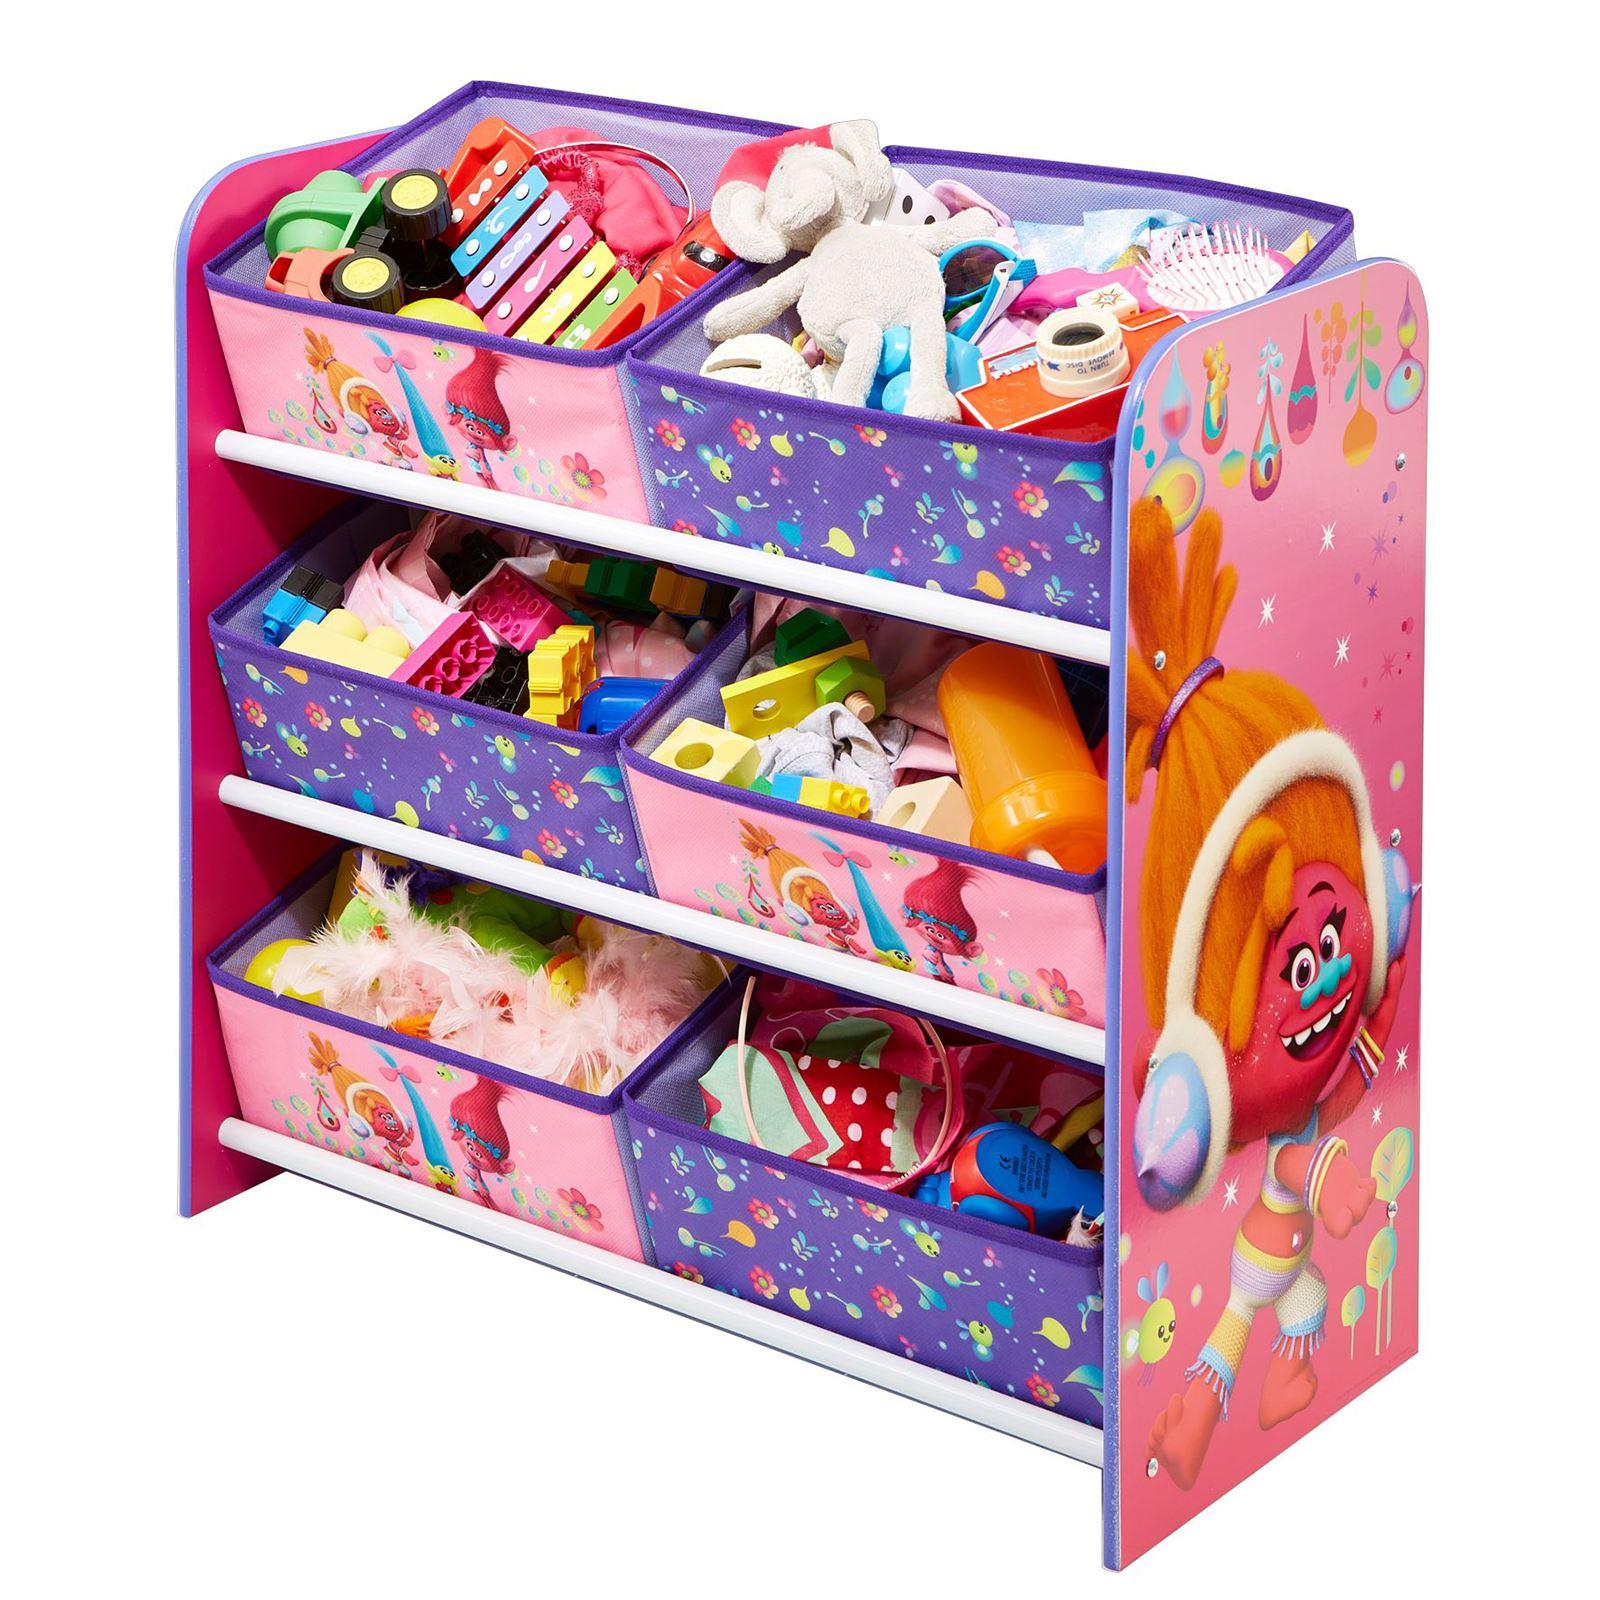 My Little Pony Metal Toy Storage Unit Box Organiser Kids: KIDS CHARACTER 6 BIN STORAGE UNIT BEDROOM FURNITURE DISNEY